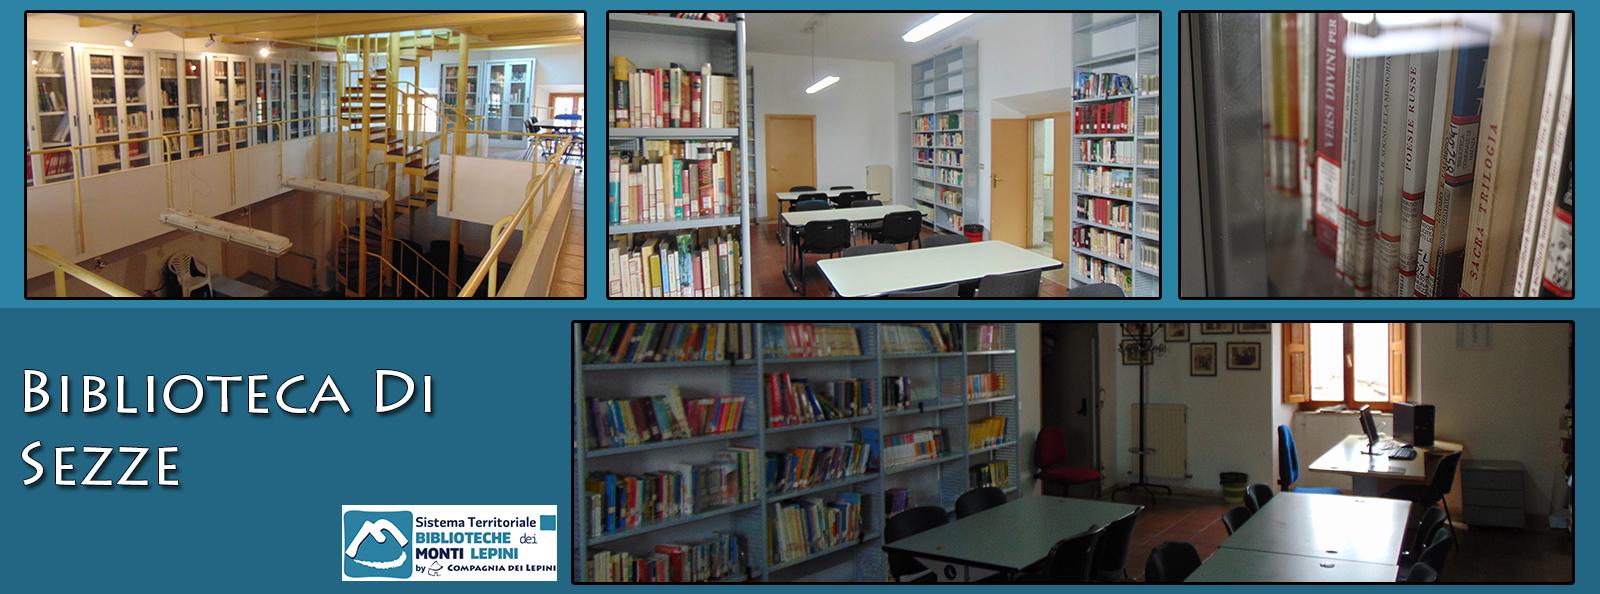 Sezze -Lt - Biblioteca Comunale